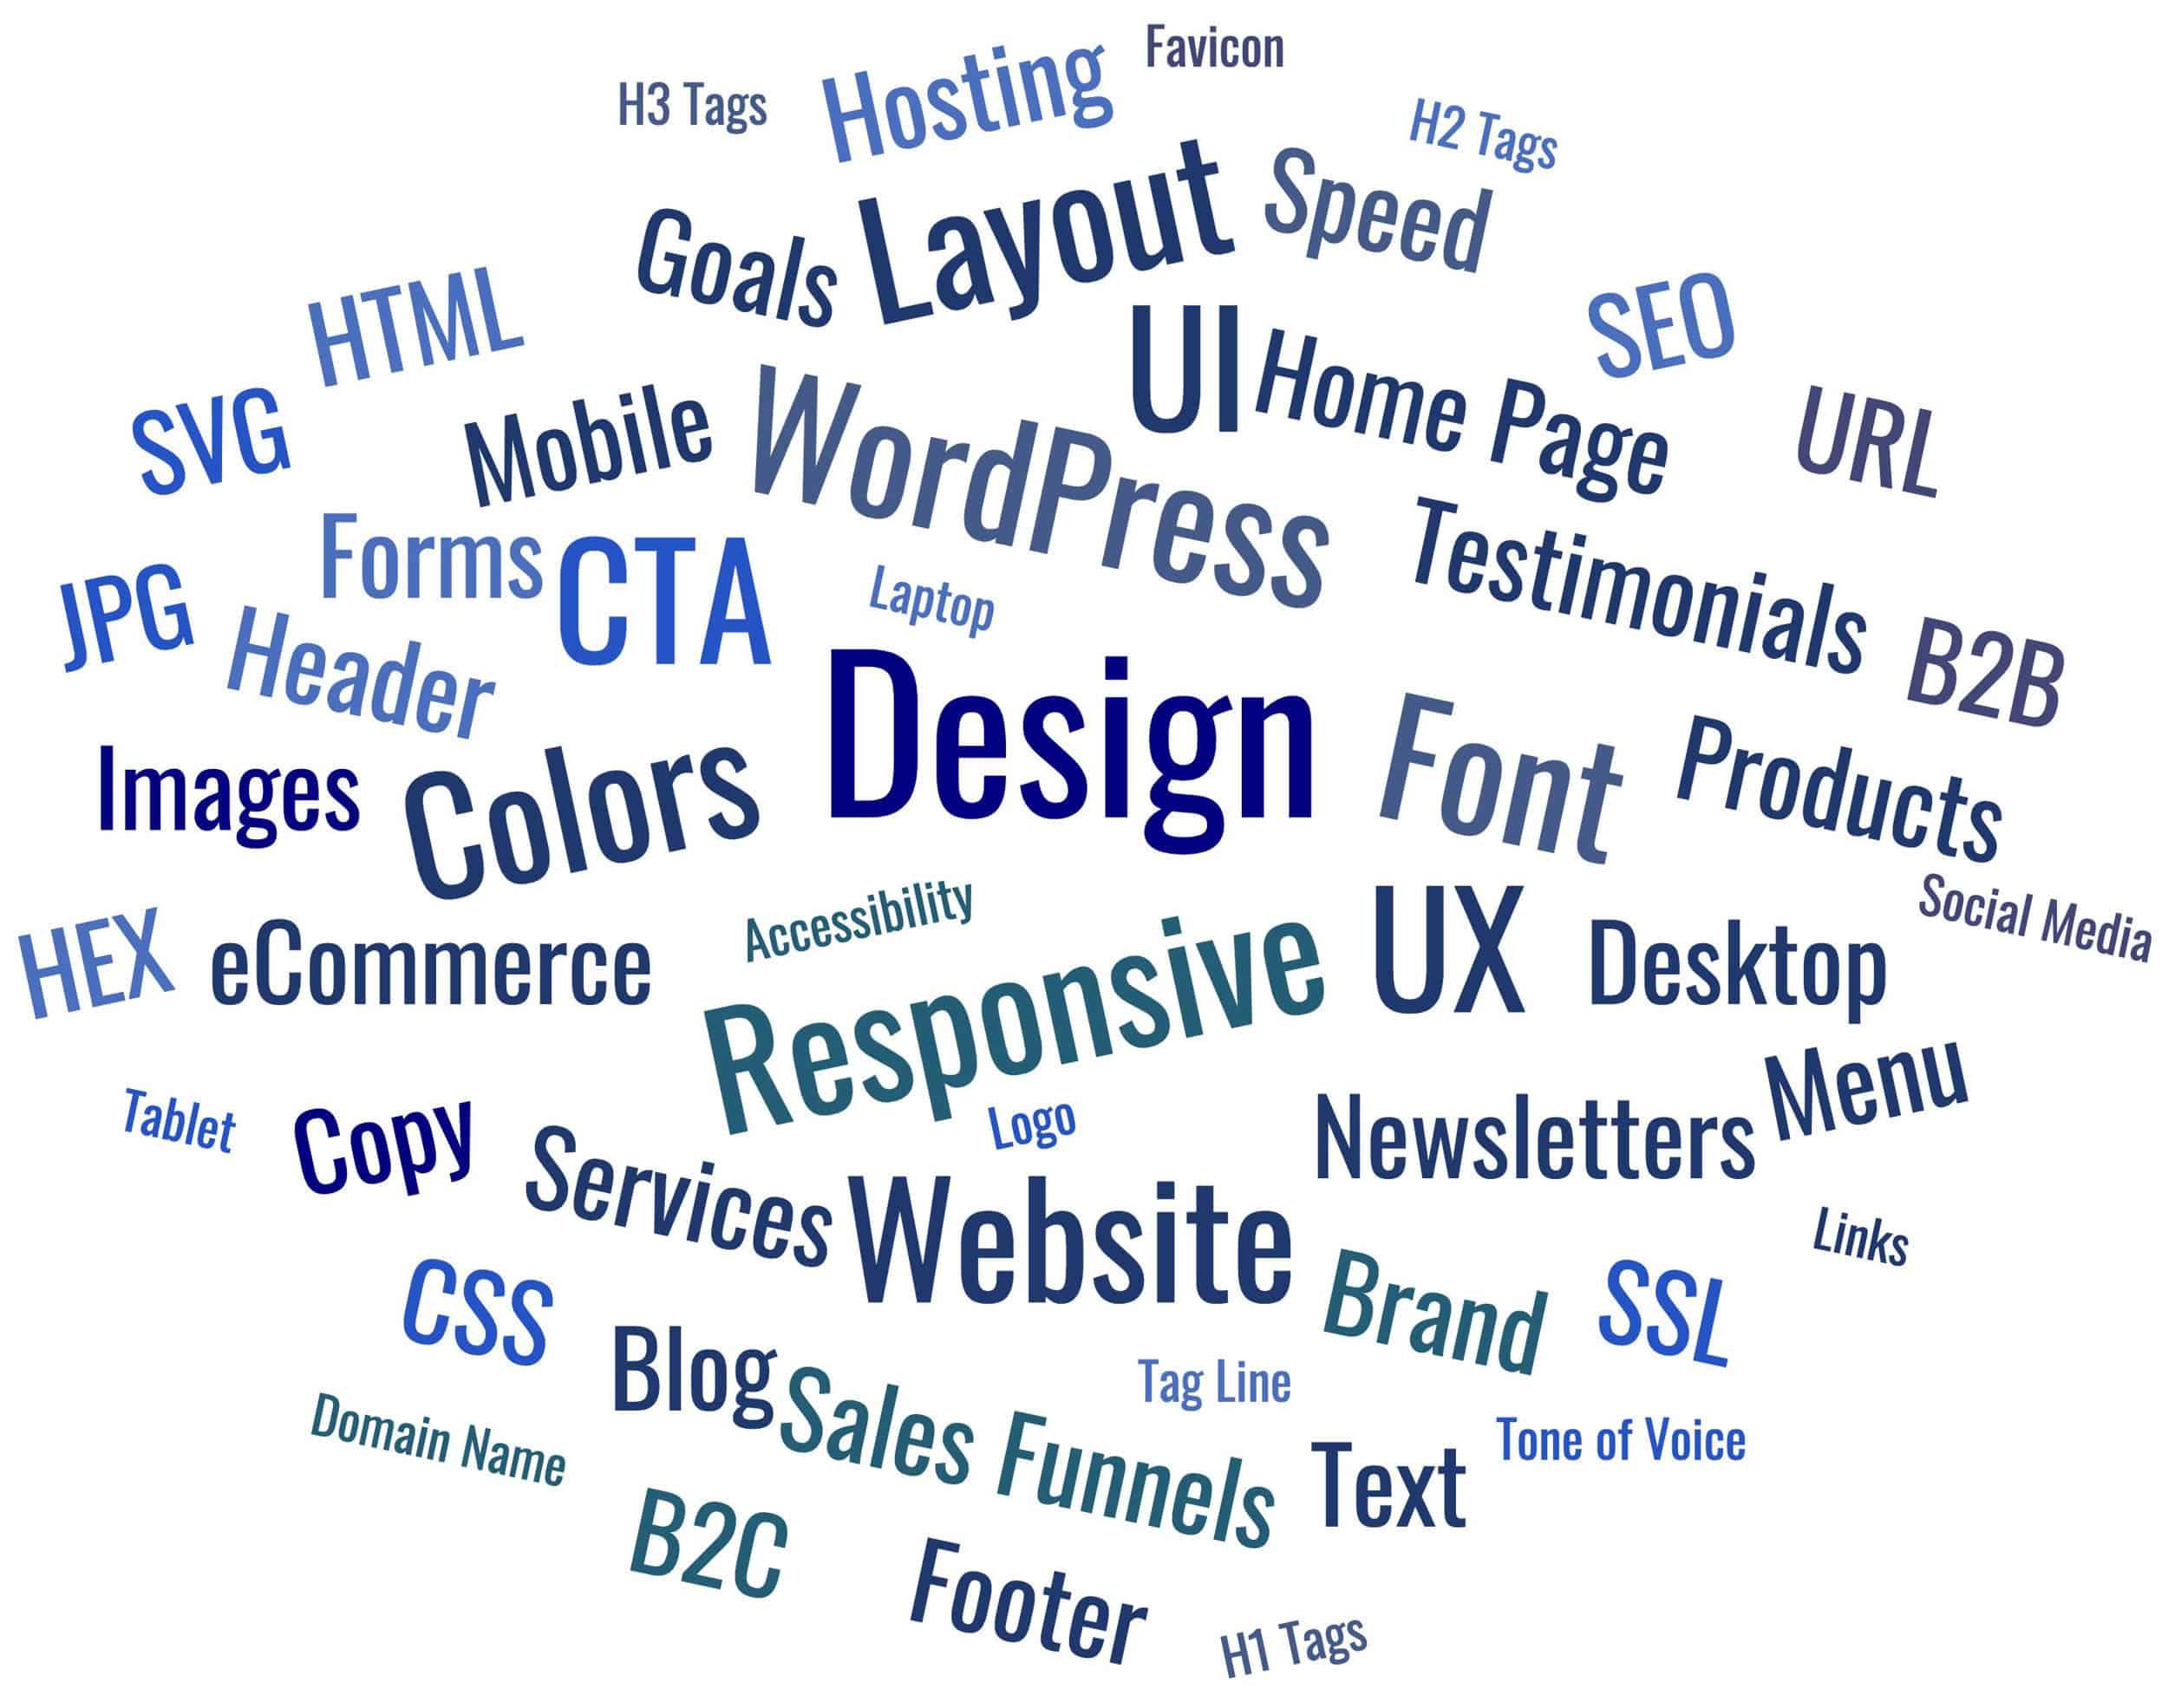 Words describing Website Design - Layout, Responsive, Font, Images, Colors, Menu, Footer, Header, Text, UX, UL